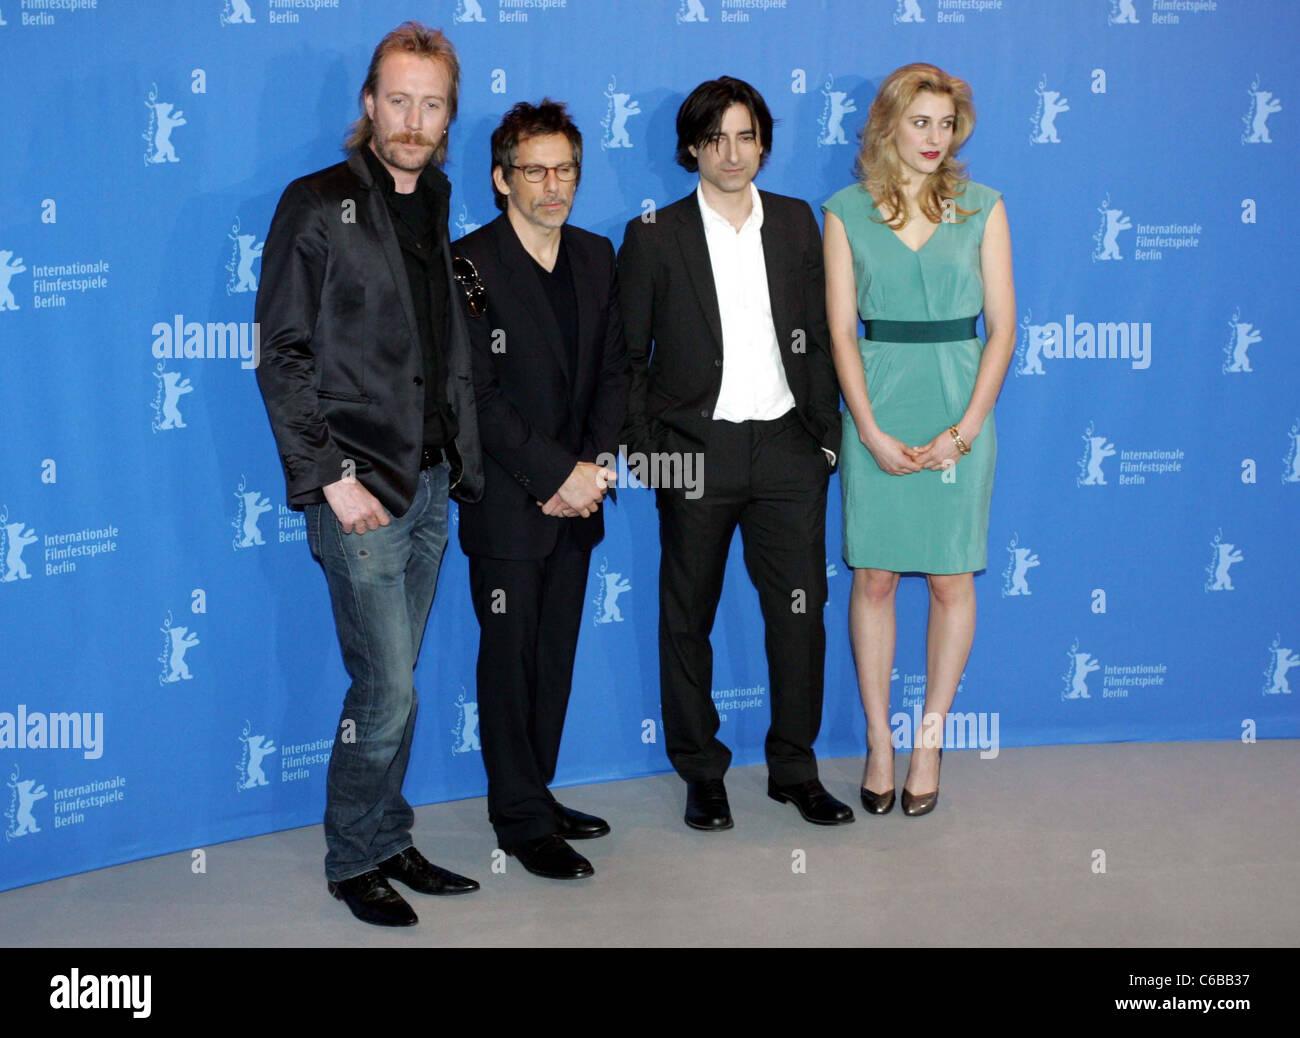 Rhys Ifans, Ben Stiller, Noah Baumbach, Greta Gerwig at the